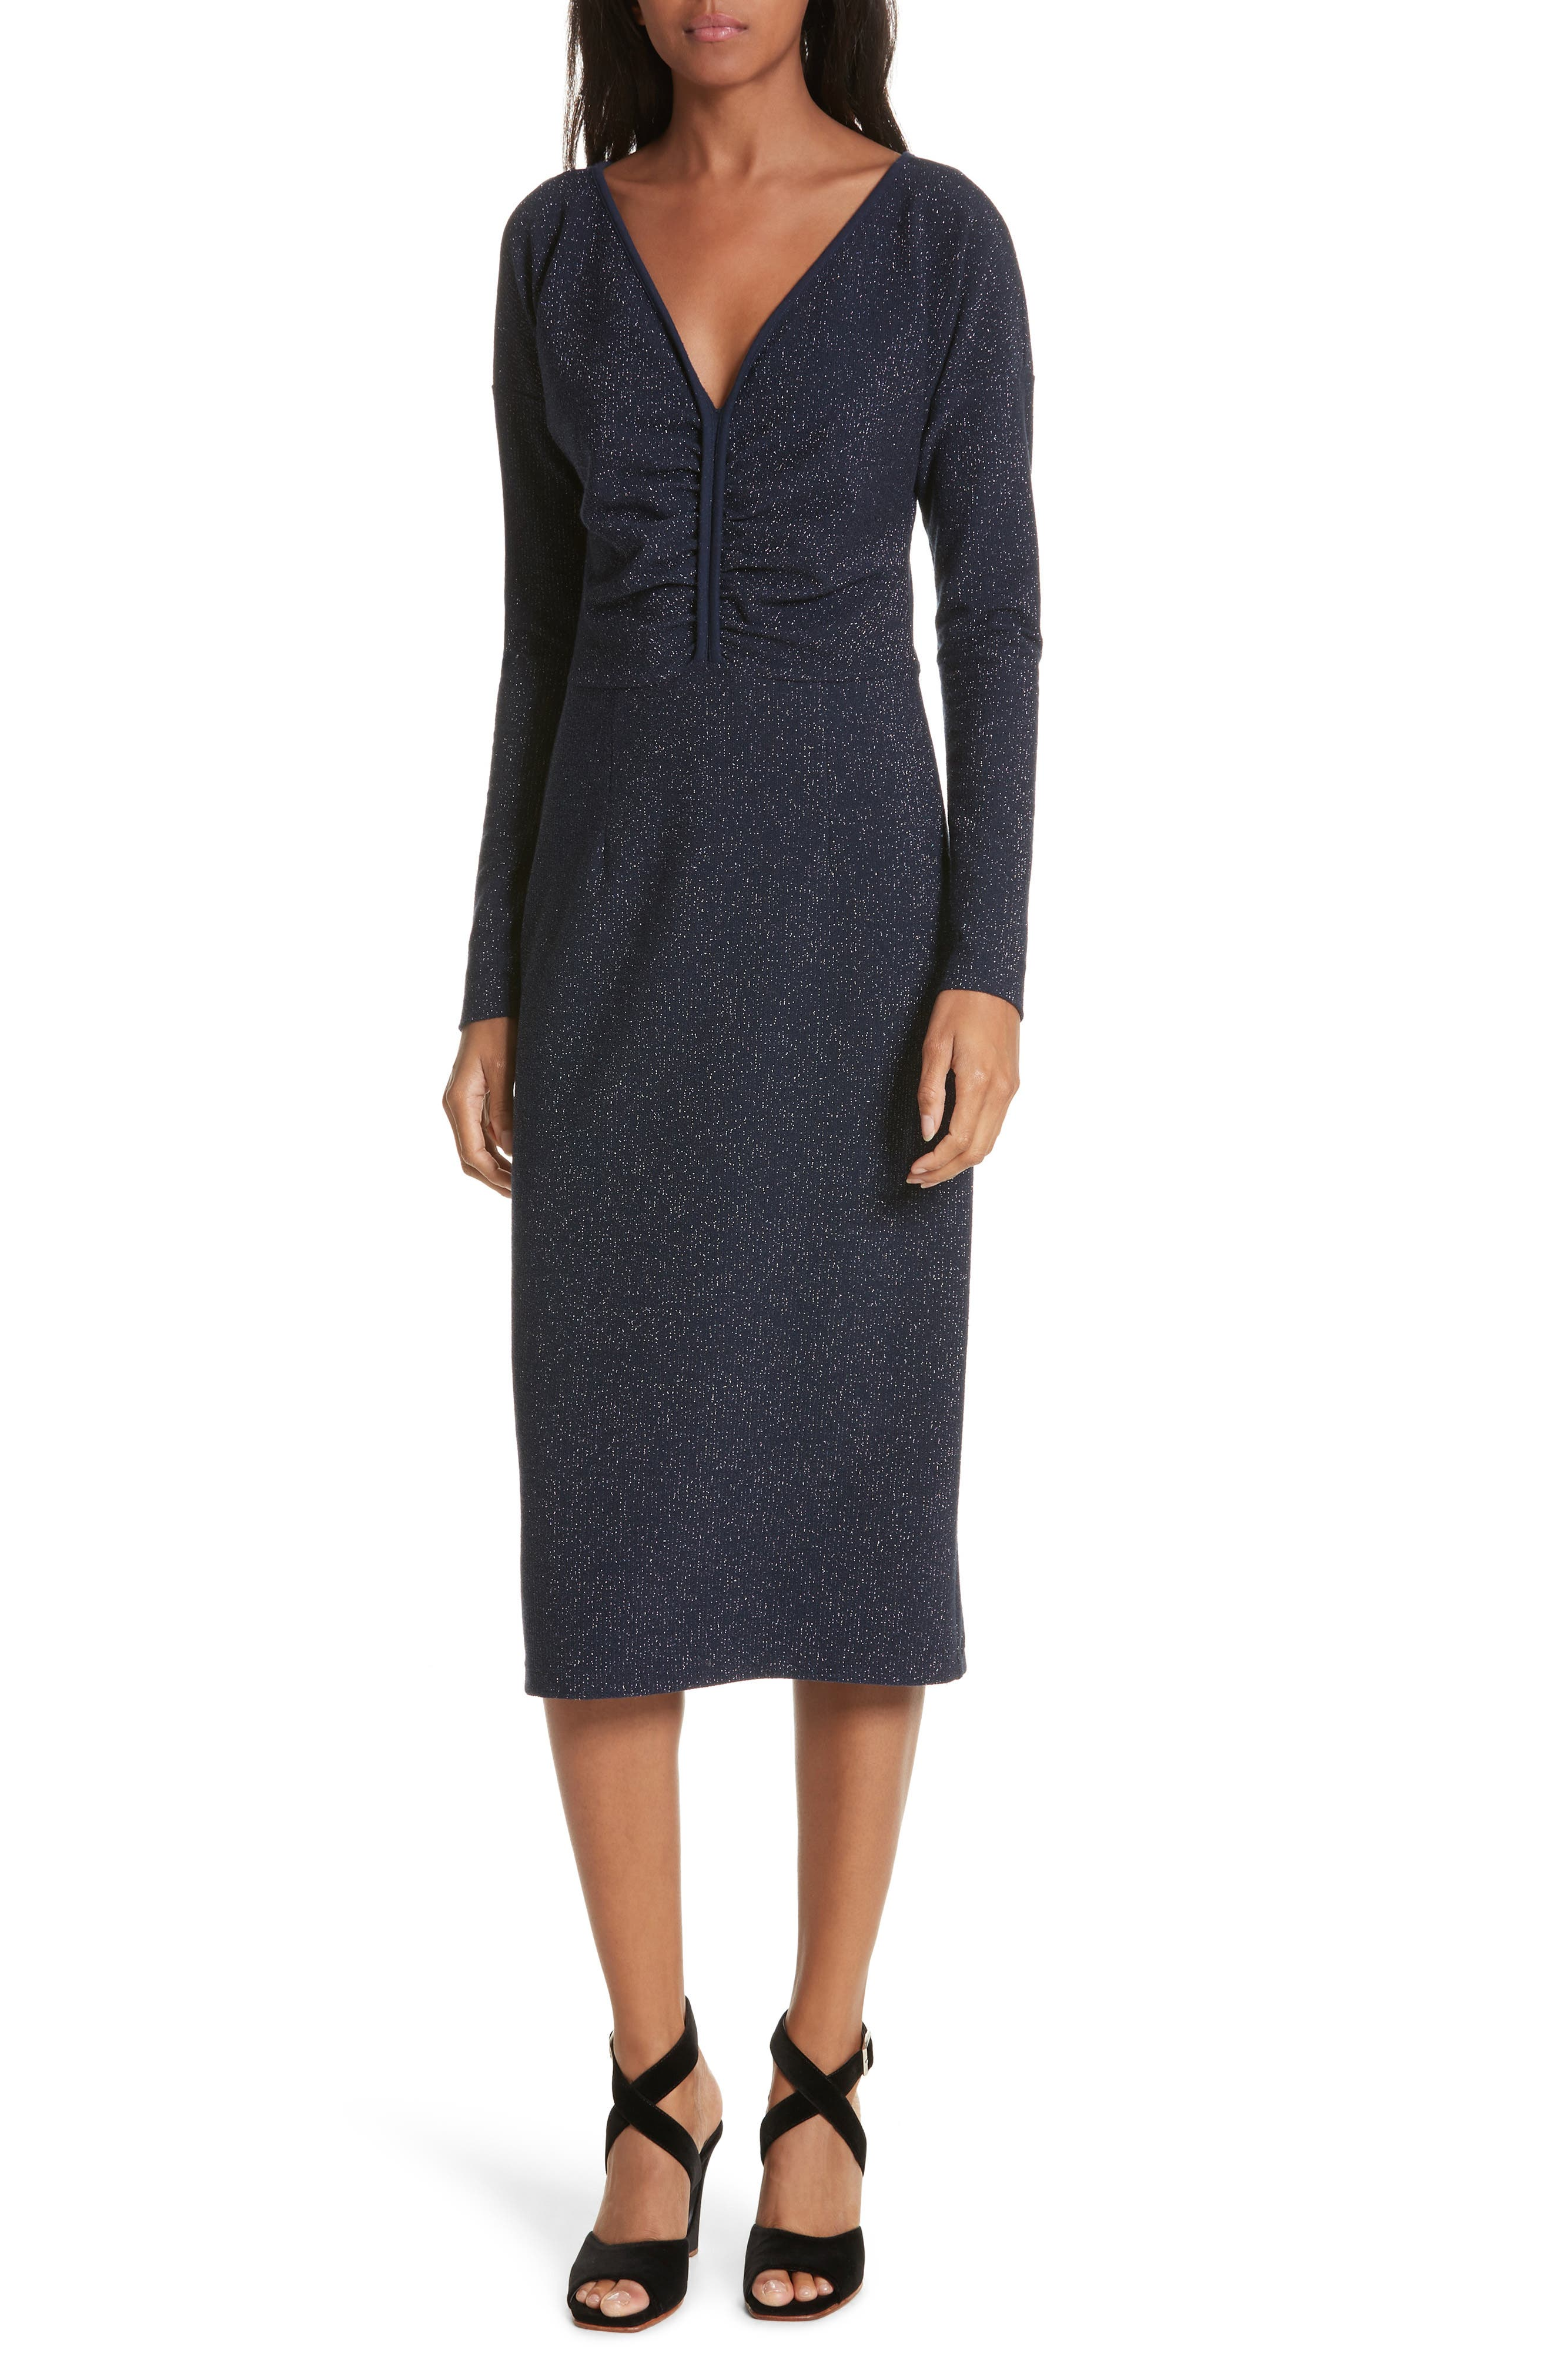 Temper Metallic Knit Dress,                             Main thumbnail 1, color,                             401